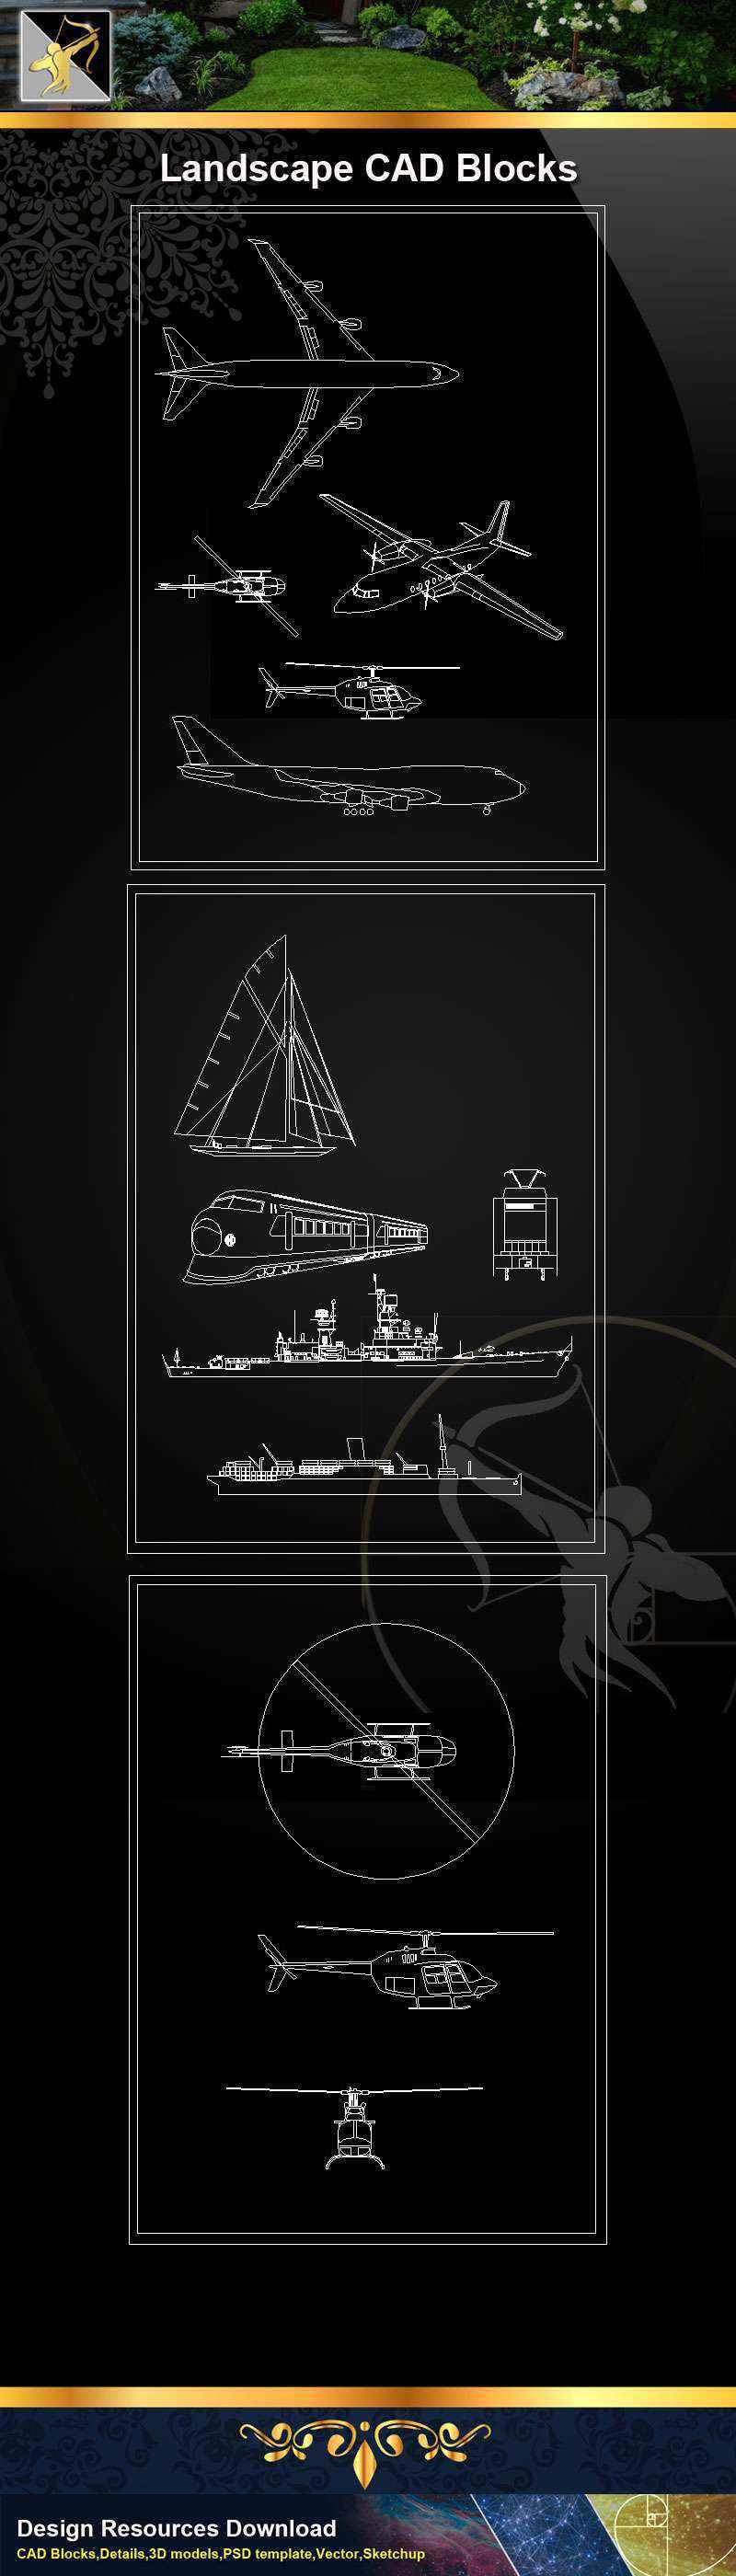 ★【Transportation Blocks】@Autocad Blocks,Drawings,CAD Details,Elevation